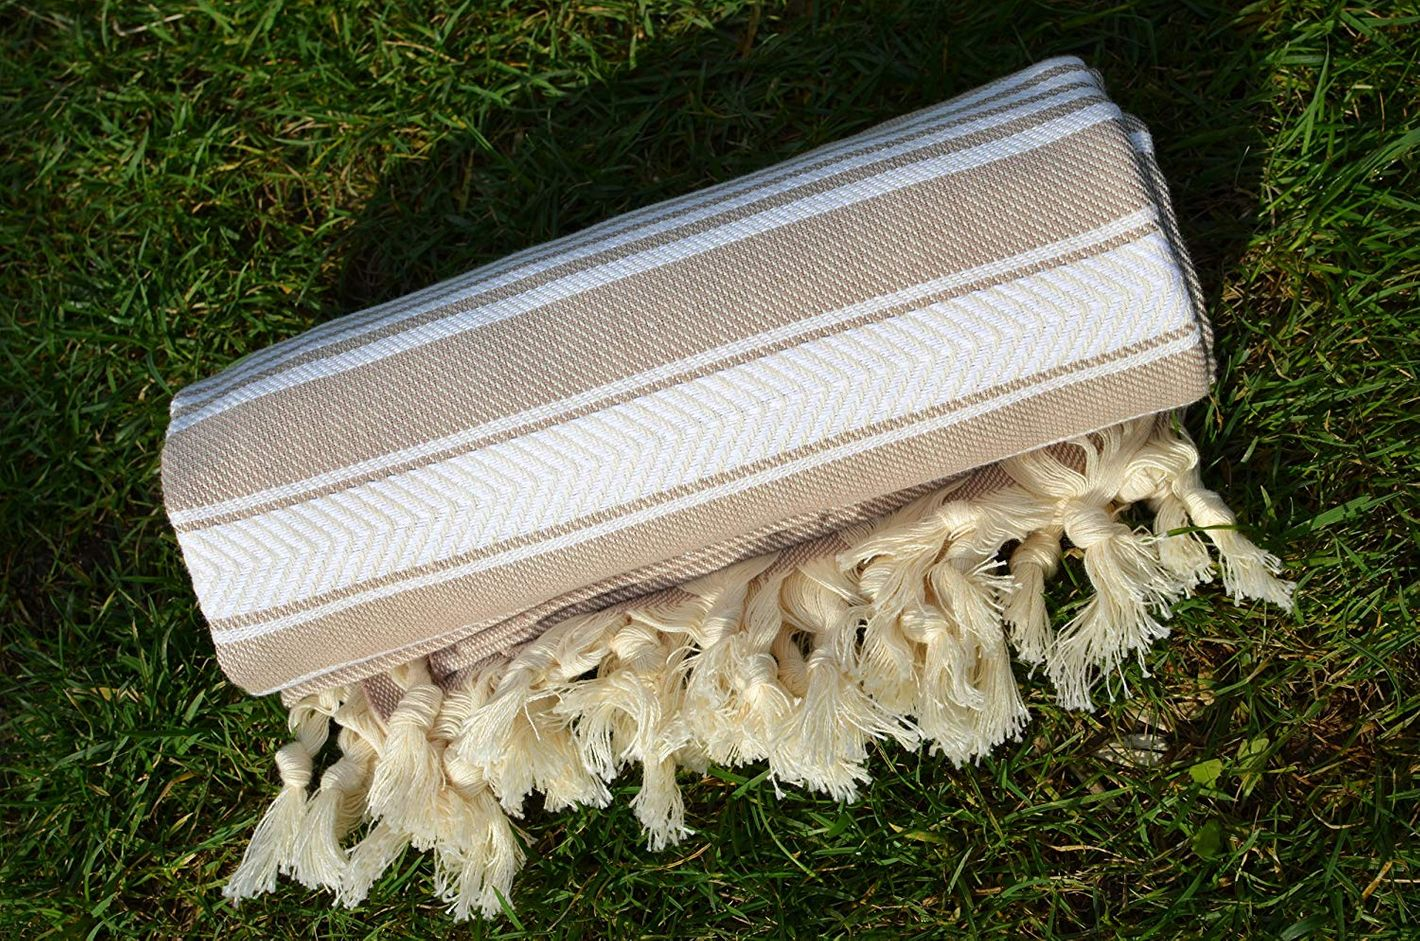 Dandelion Textile Naturally-Dyed Cotton Turkish Towel Peshtemal